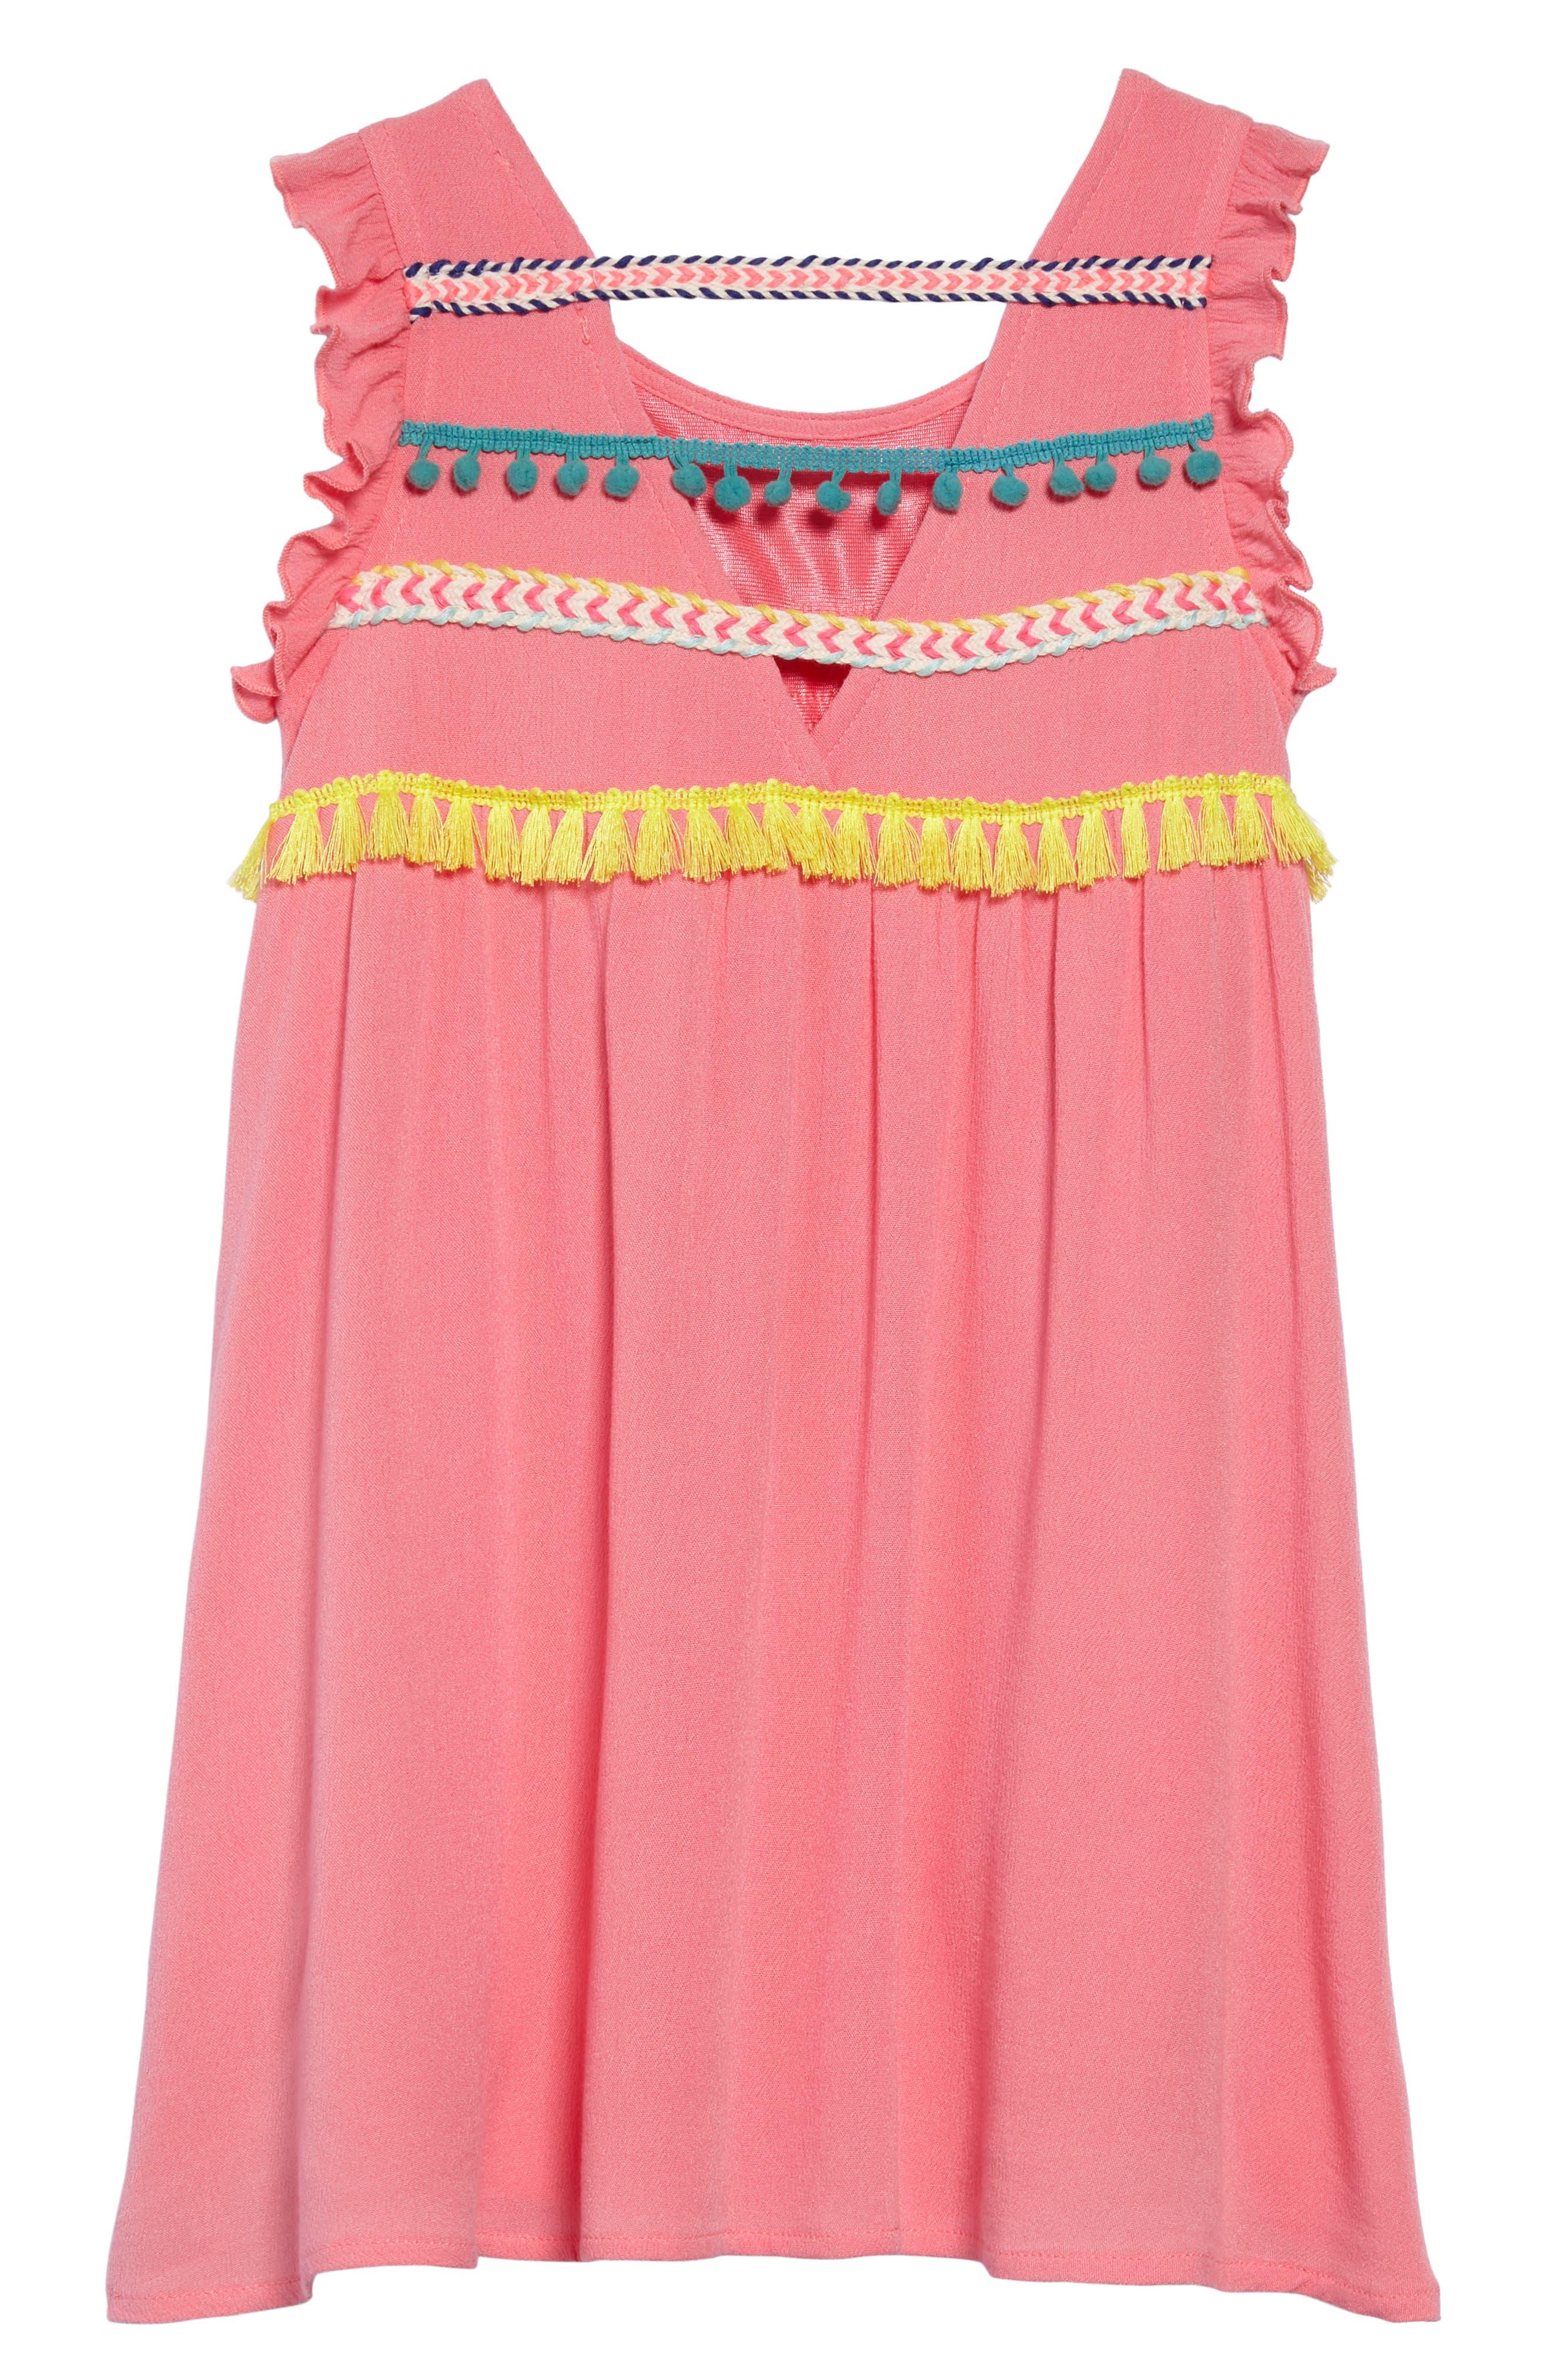 Trim Babydoll Dress,                             Alternate thumbnail 4, color,                             951